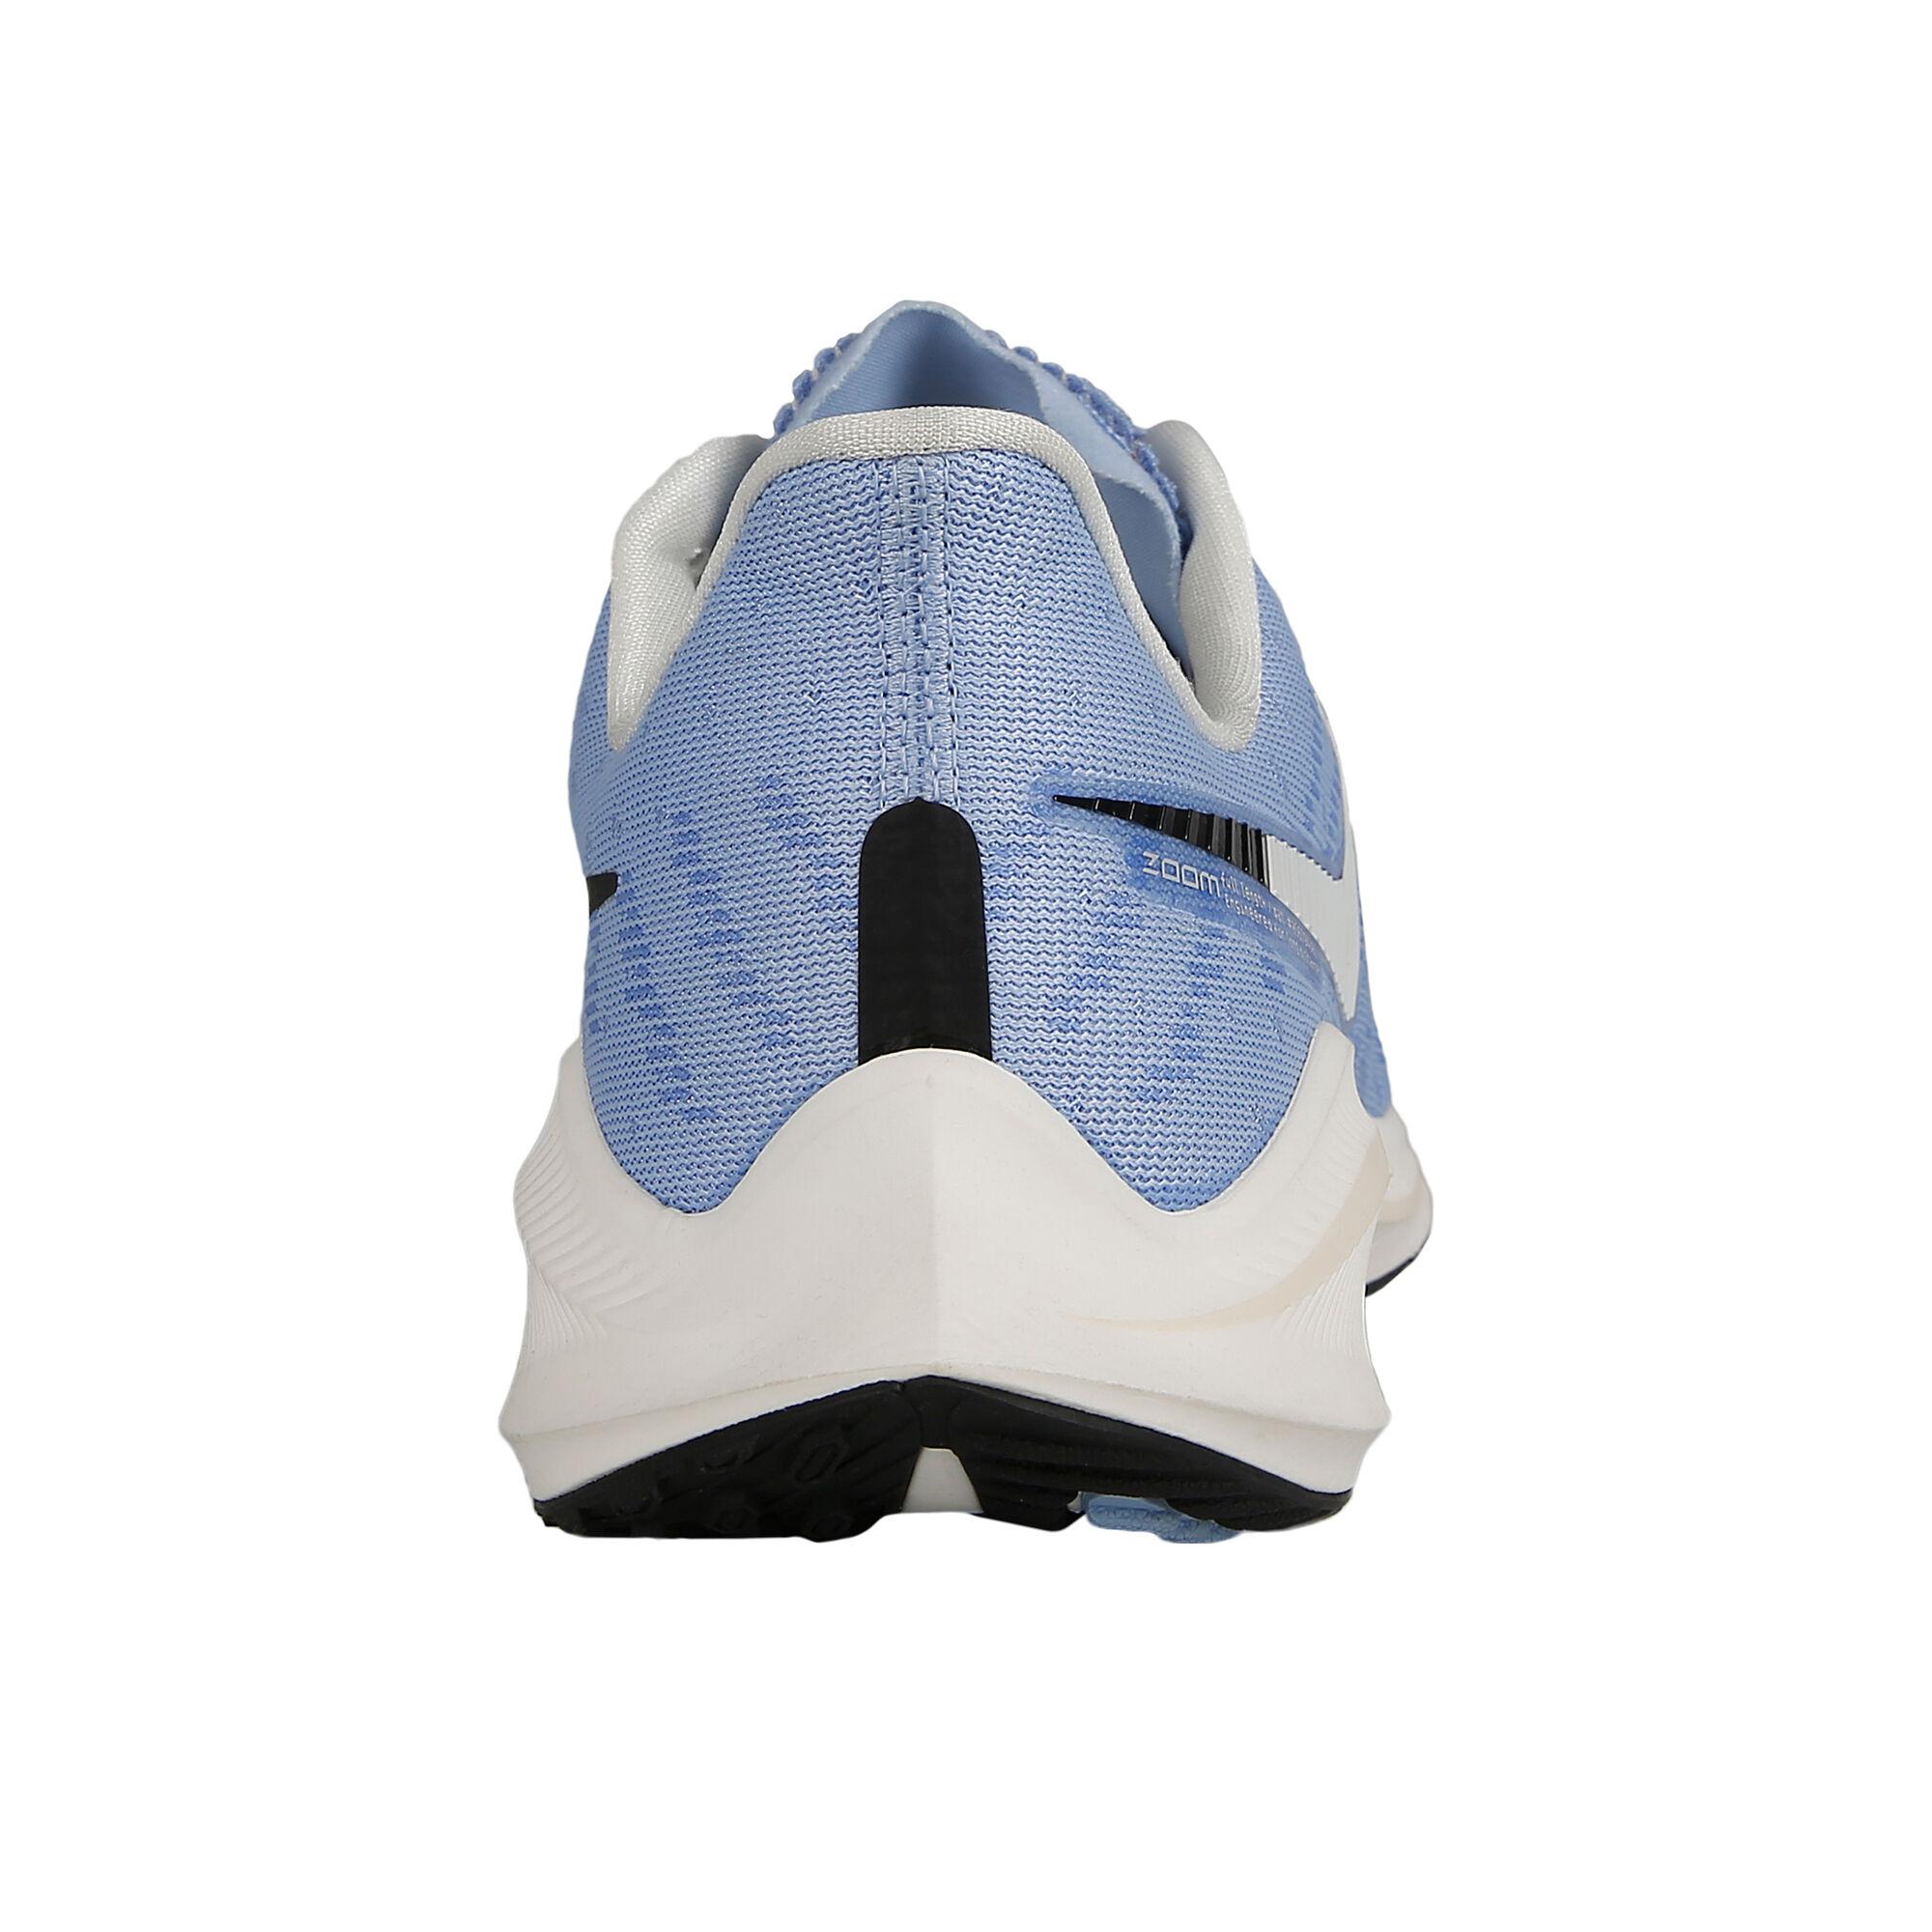 size 40 75a20 27502 buy Nike Air Zoom Vomero 14 Neutral Running Shoe Women - Light Blue ...